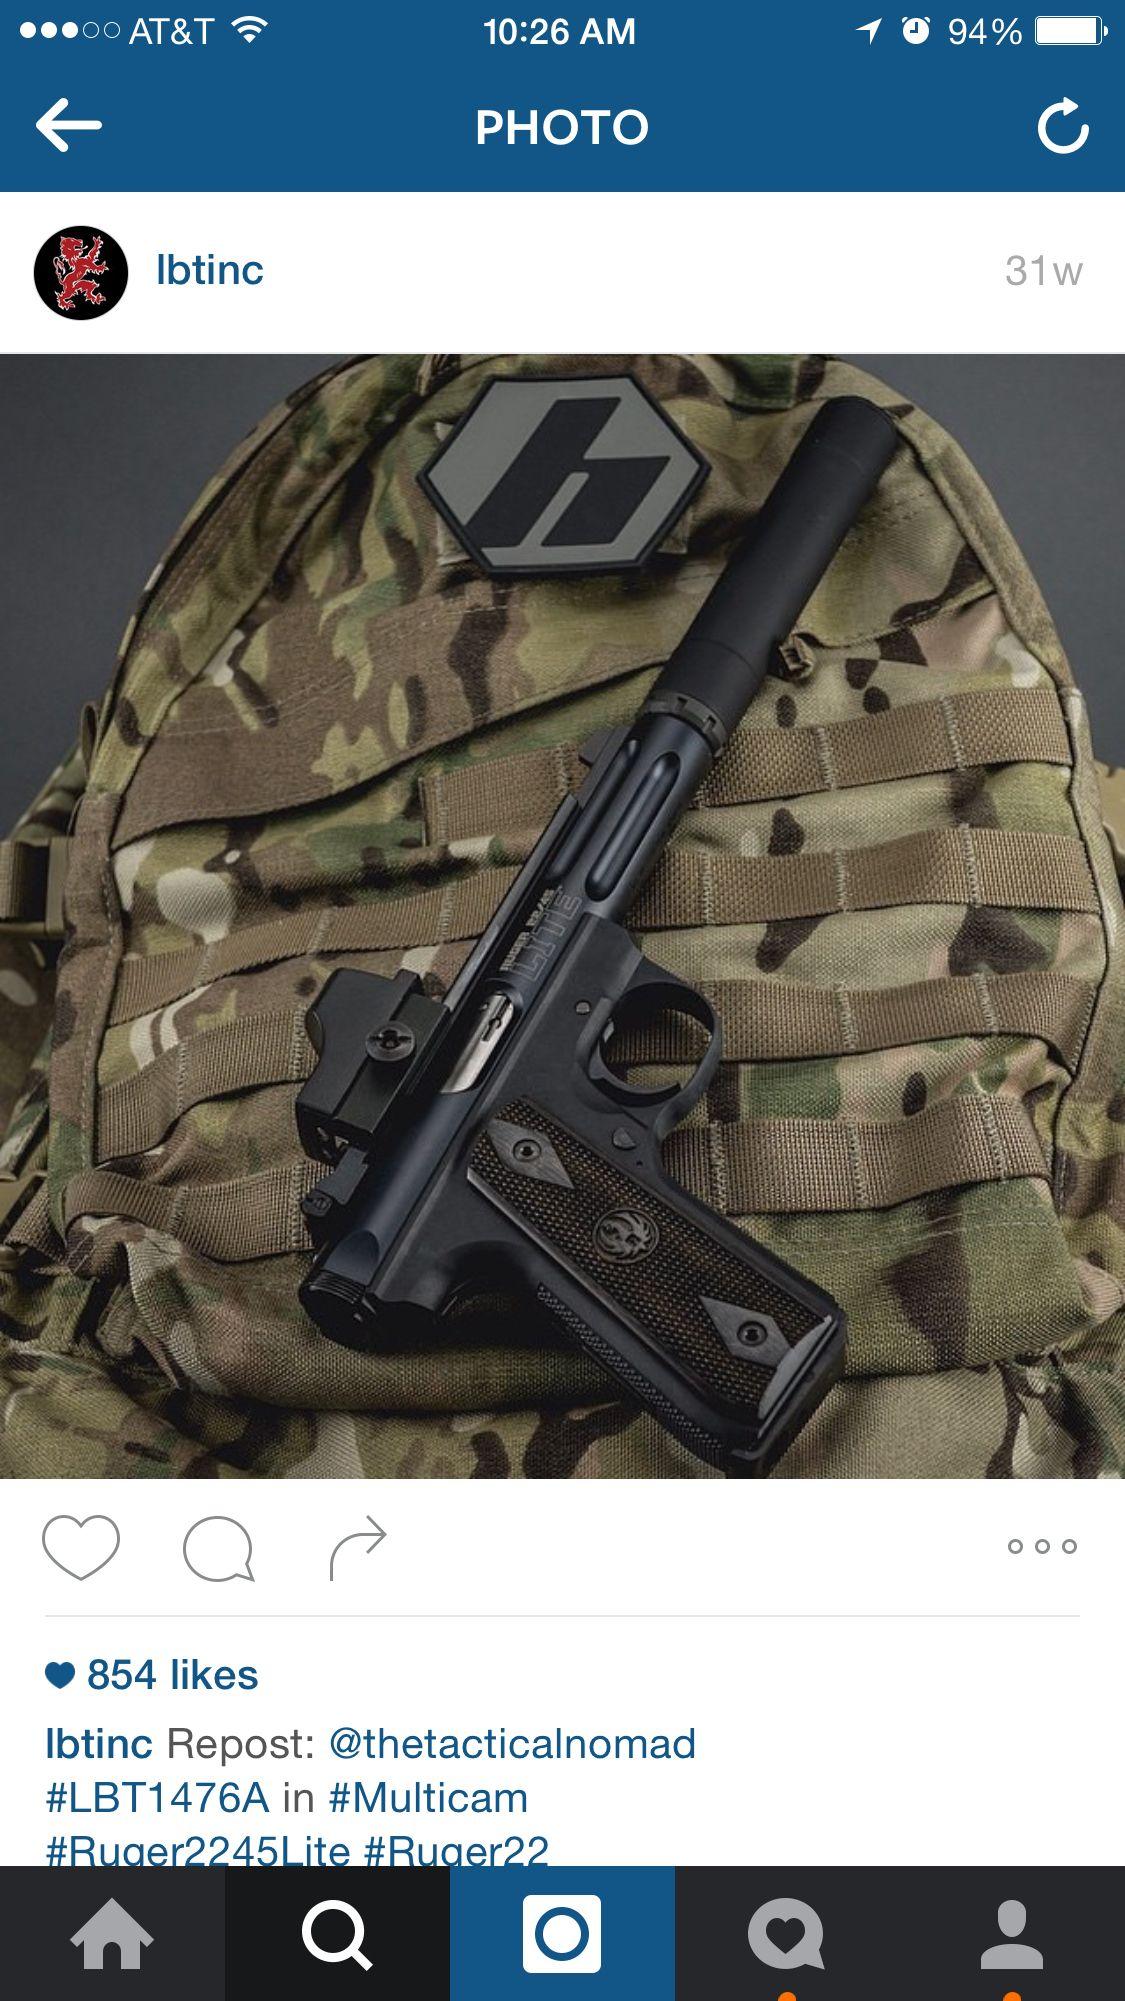 Ruger .22 pistol silenced